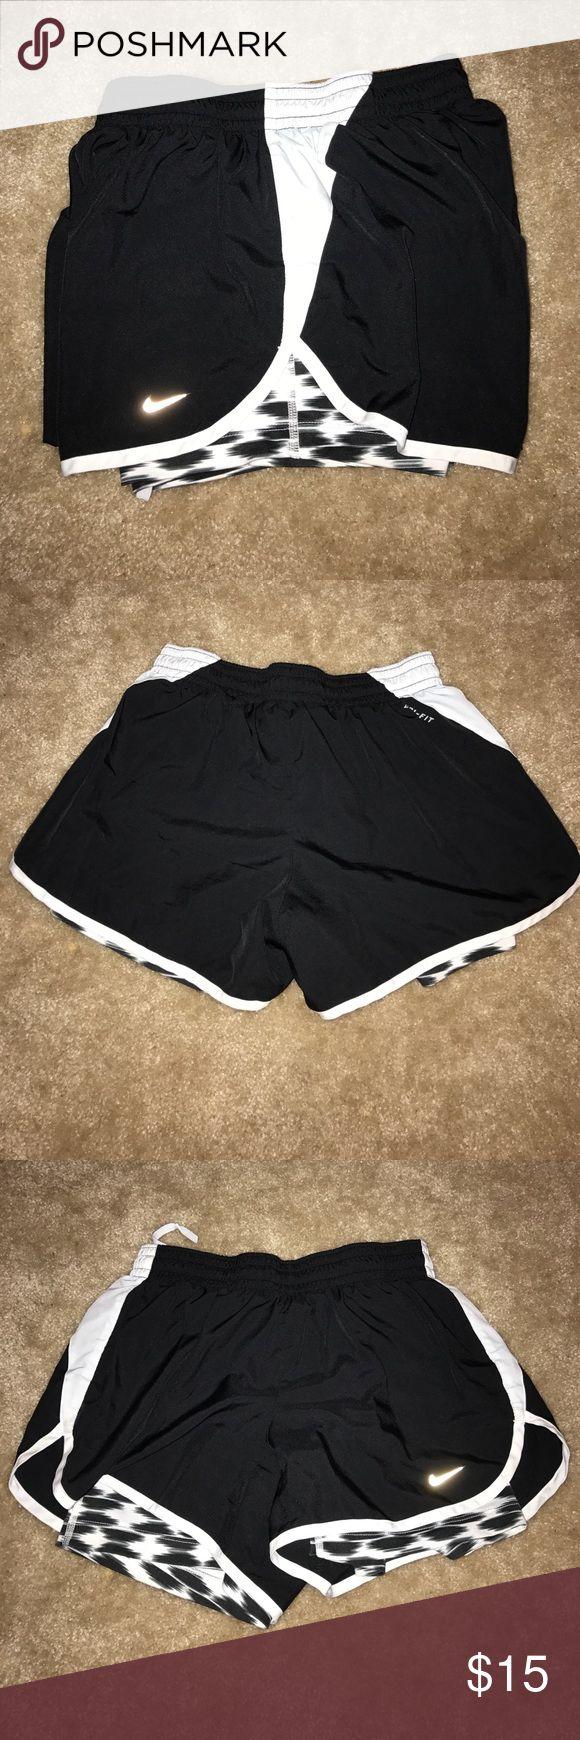 Nike Dri Fit Shorts with Spandex underneath No flaws! Has spandex underneath. Nike Shorts